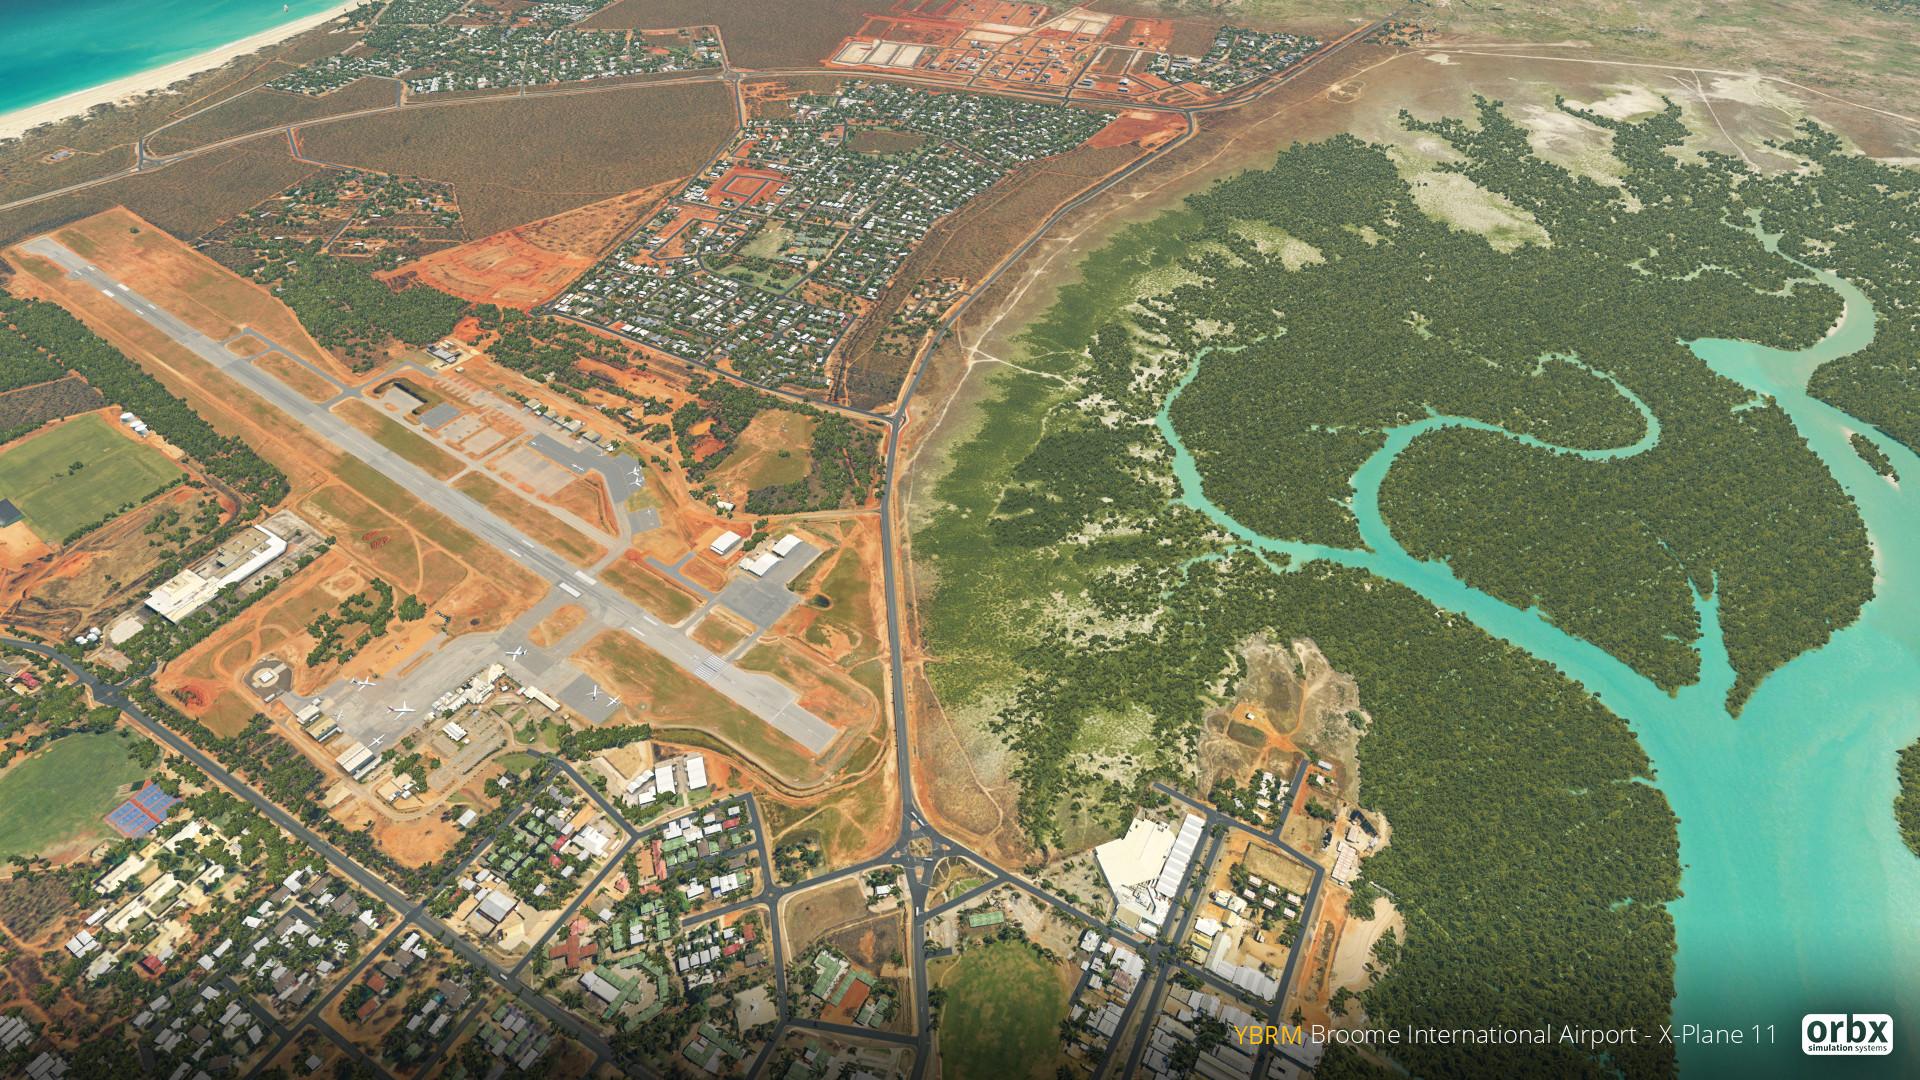 YBRM Broome International Airport